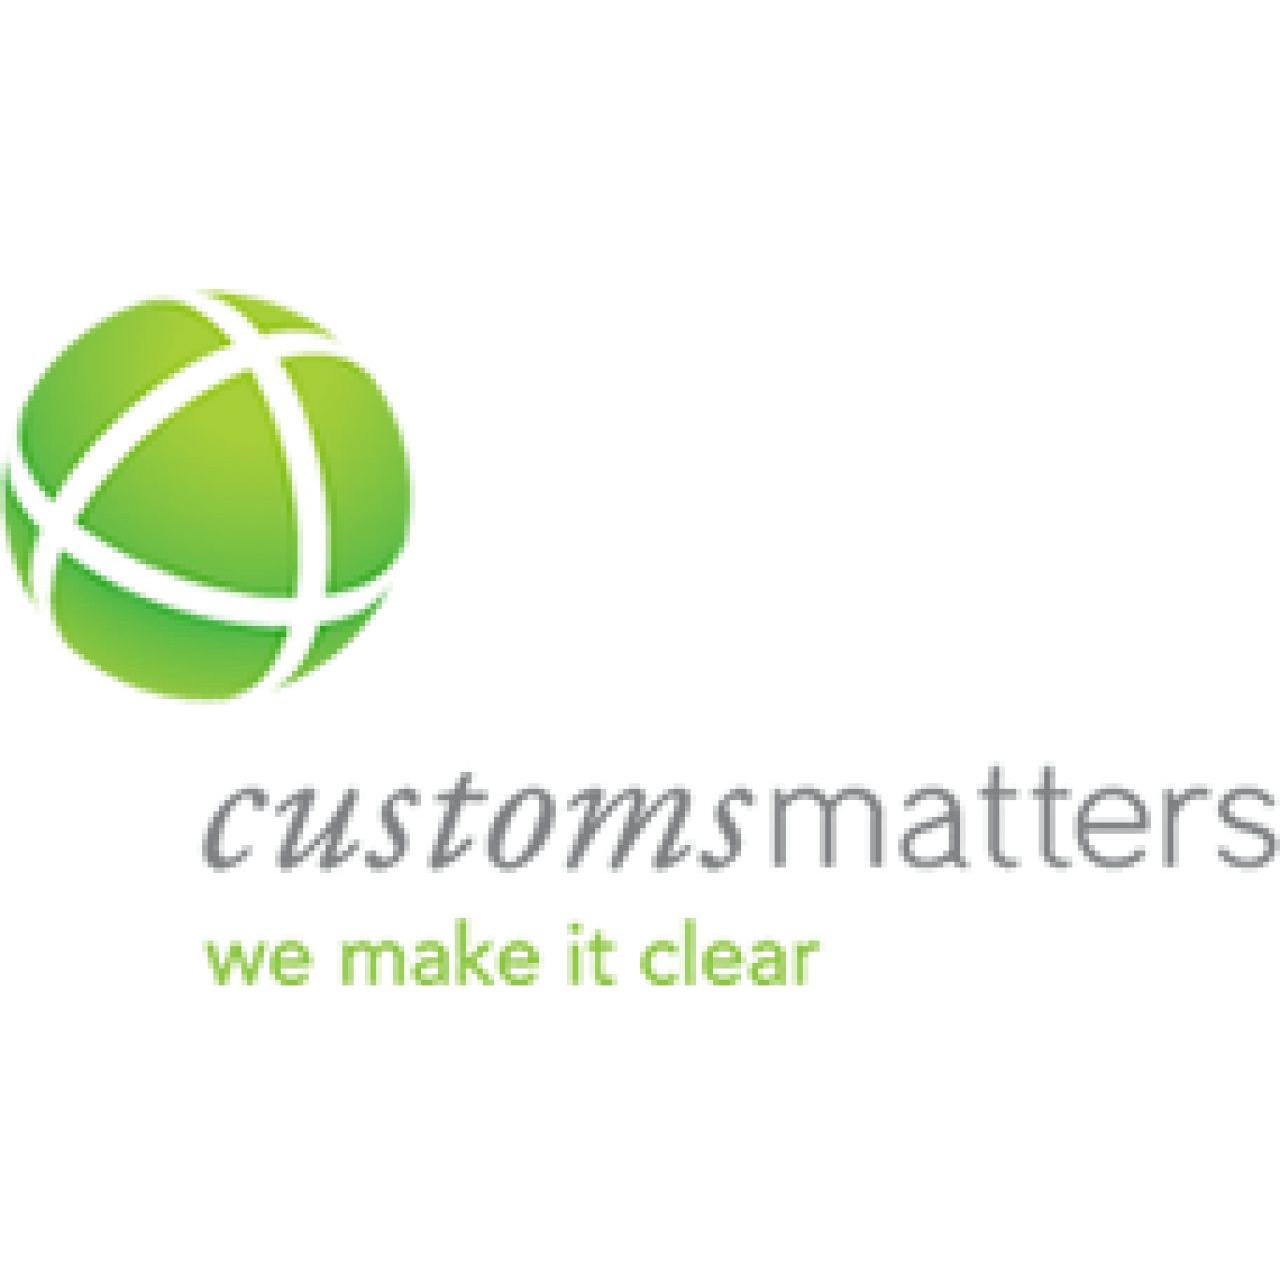 Customs Matters